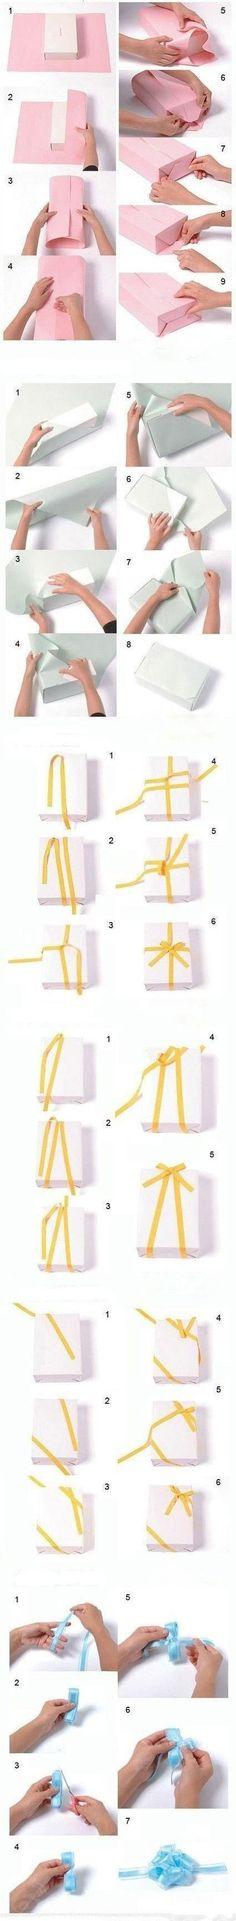 How to wrap a gift box | DIY Creative Ideas